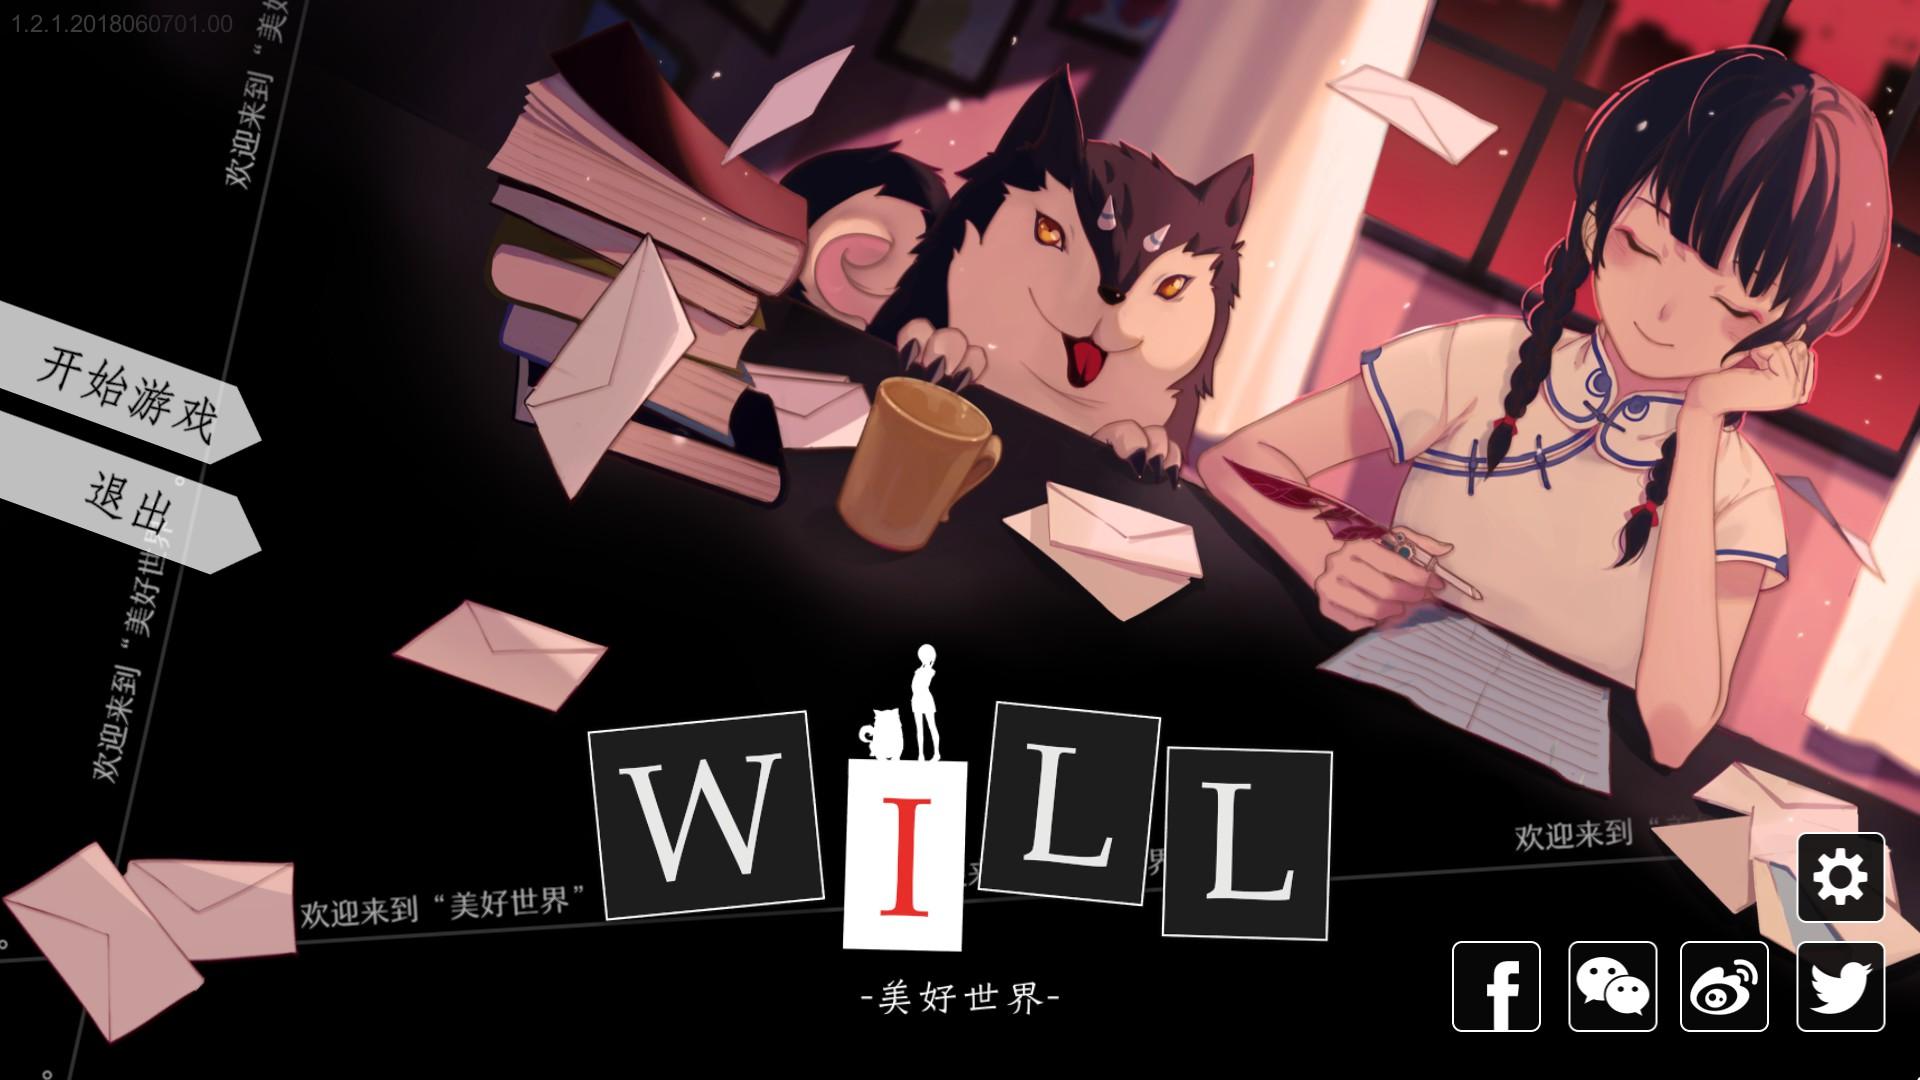 《will美好世界》游戏评测,利用文字的奥妙将人类的命运扭转